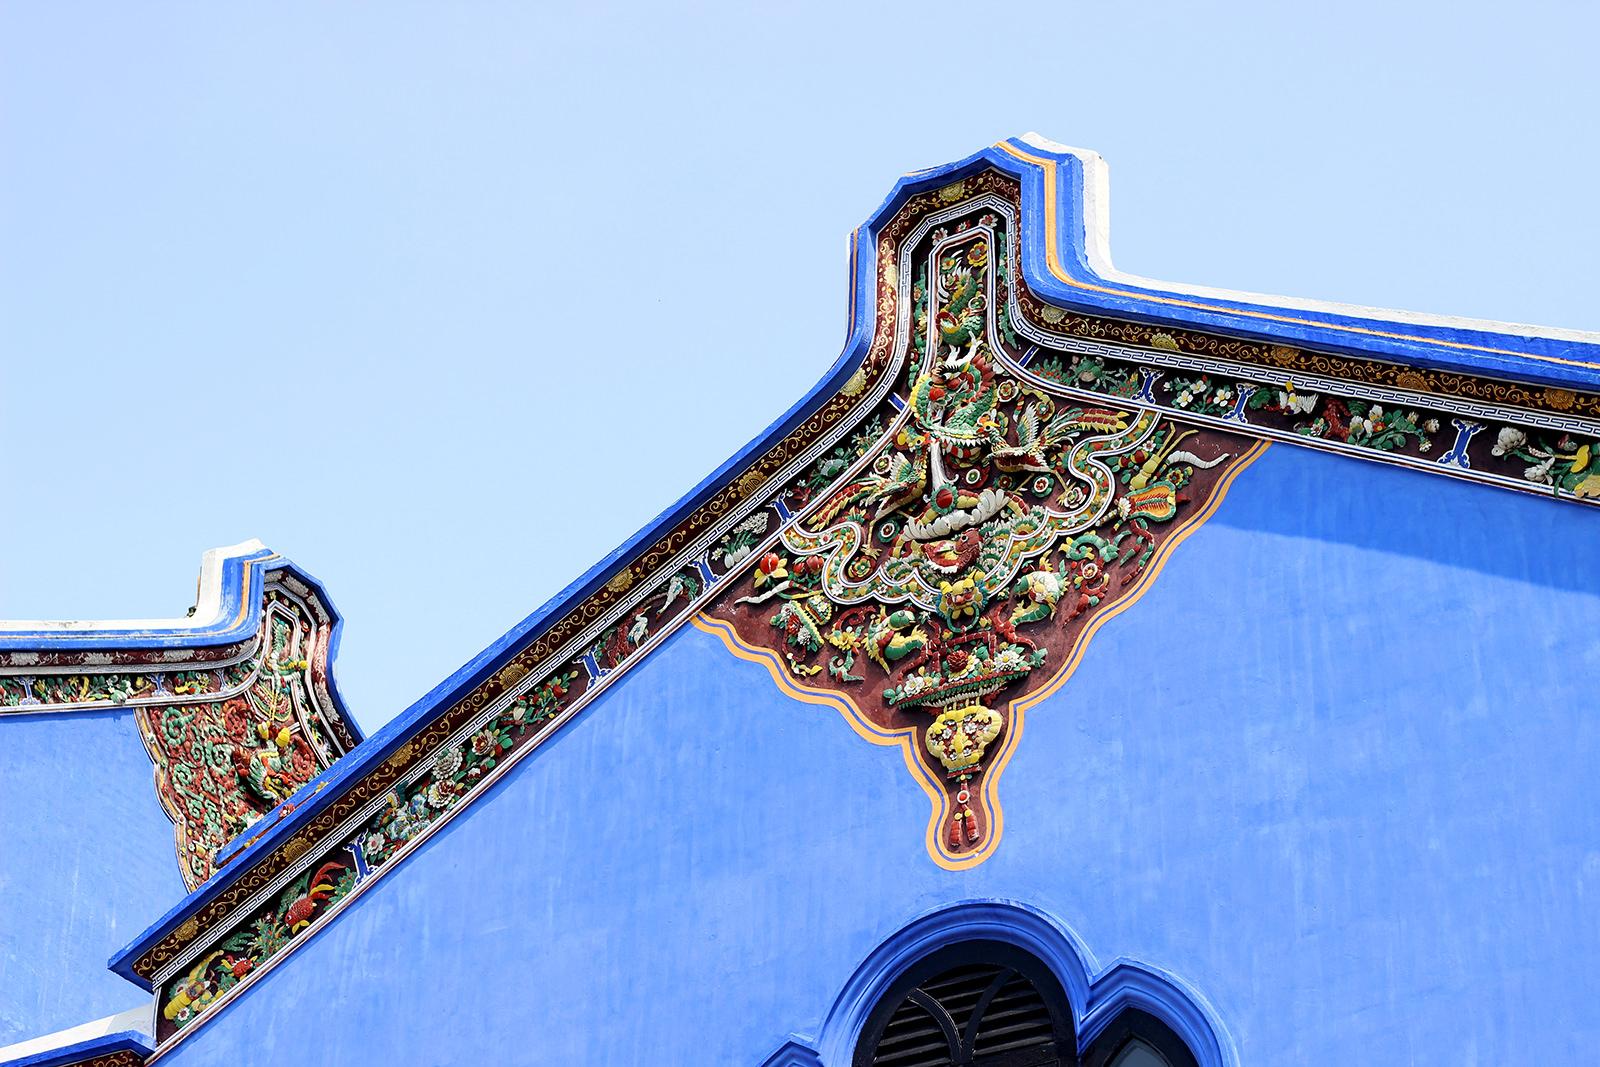 boutique-hotel-penang-island-blue-mansion-architecture-09 Architecture